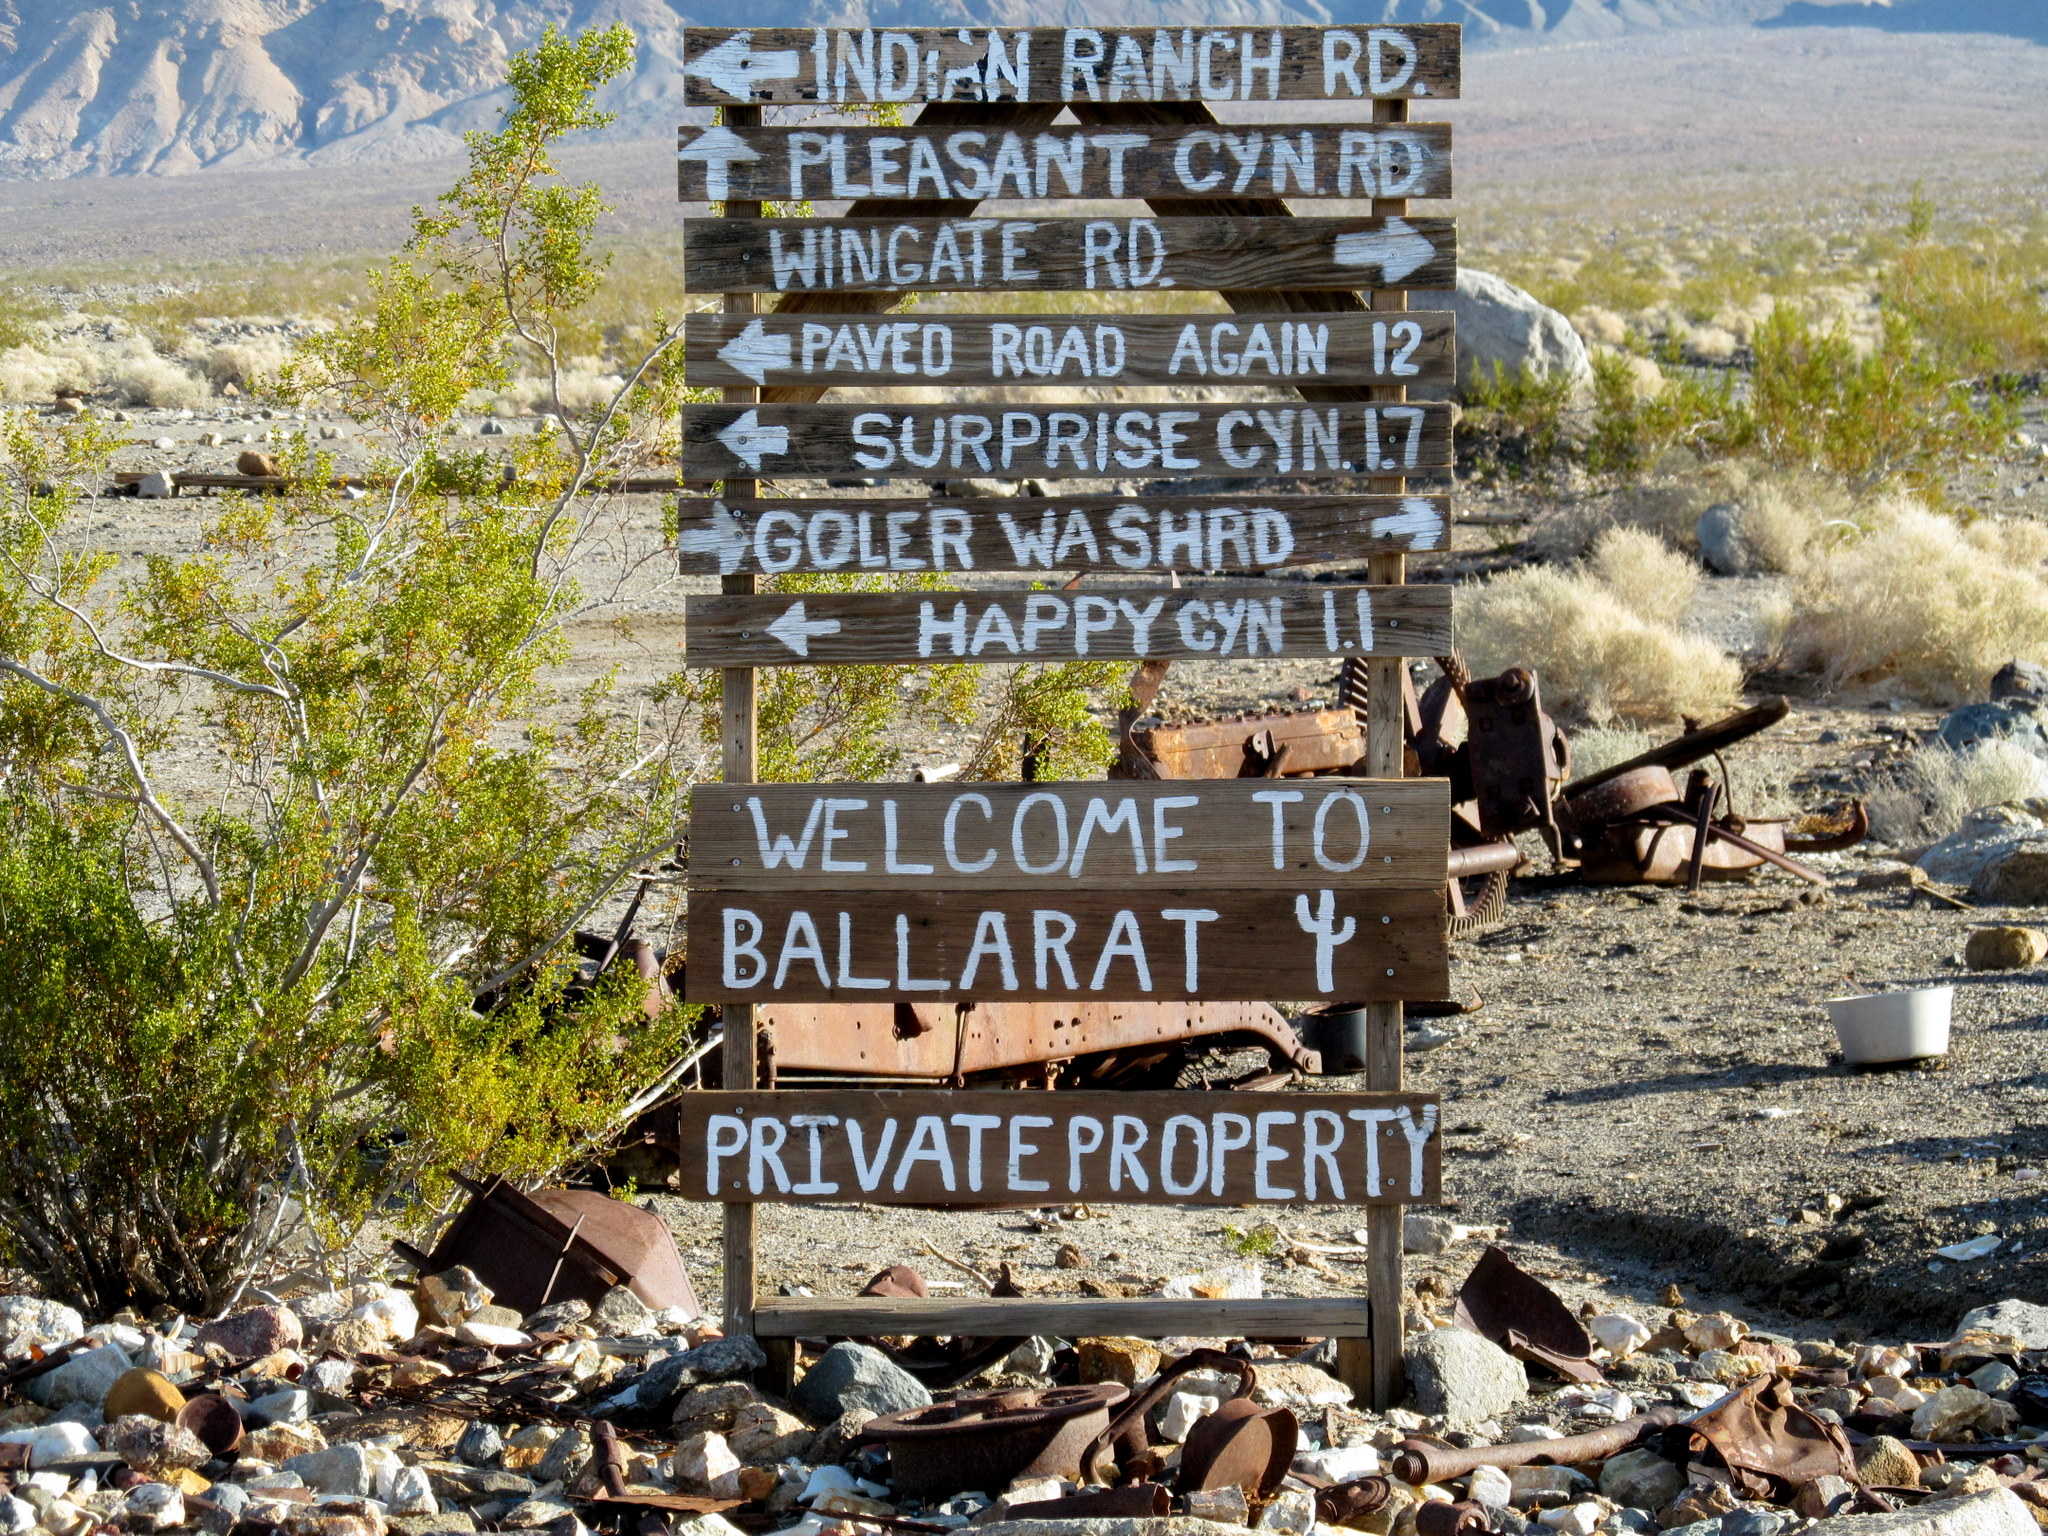 Photo: Signage in Ballarat